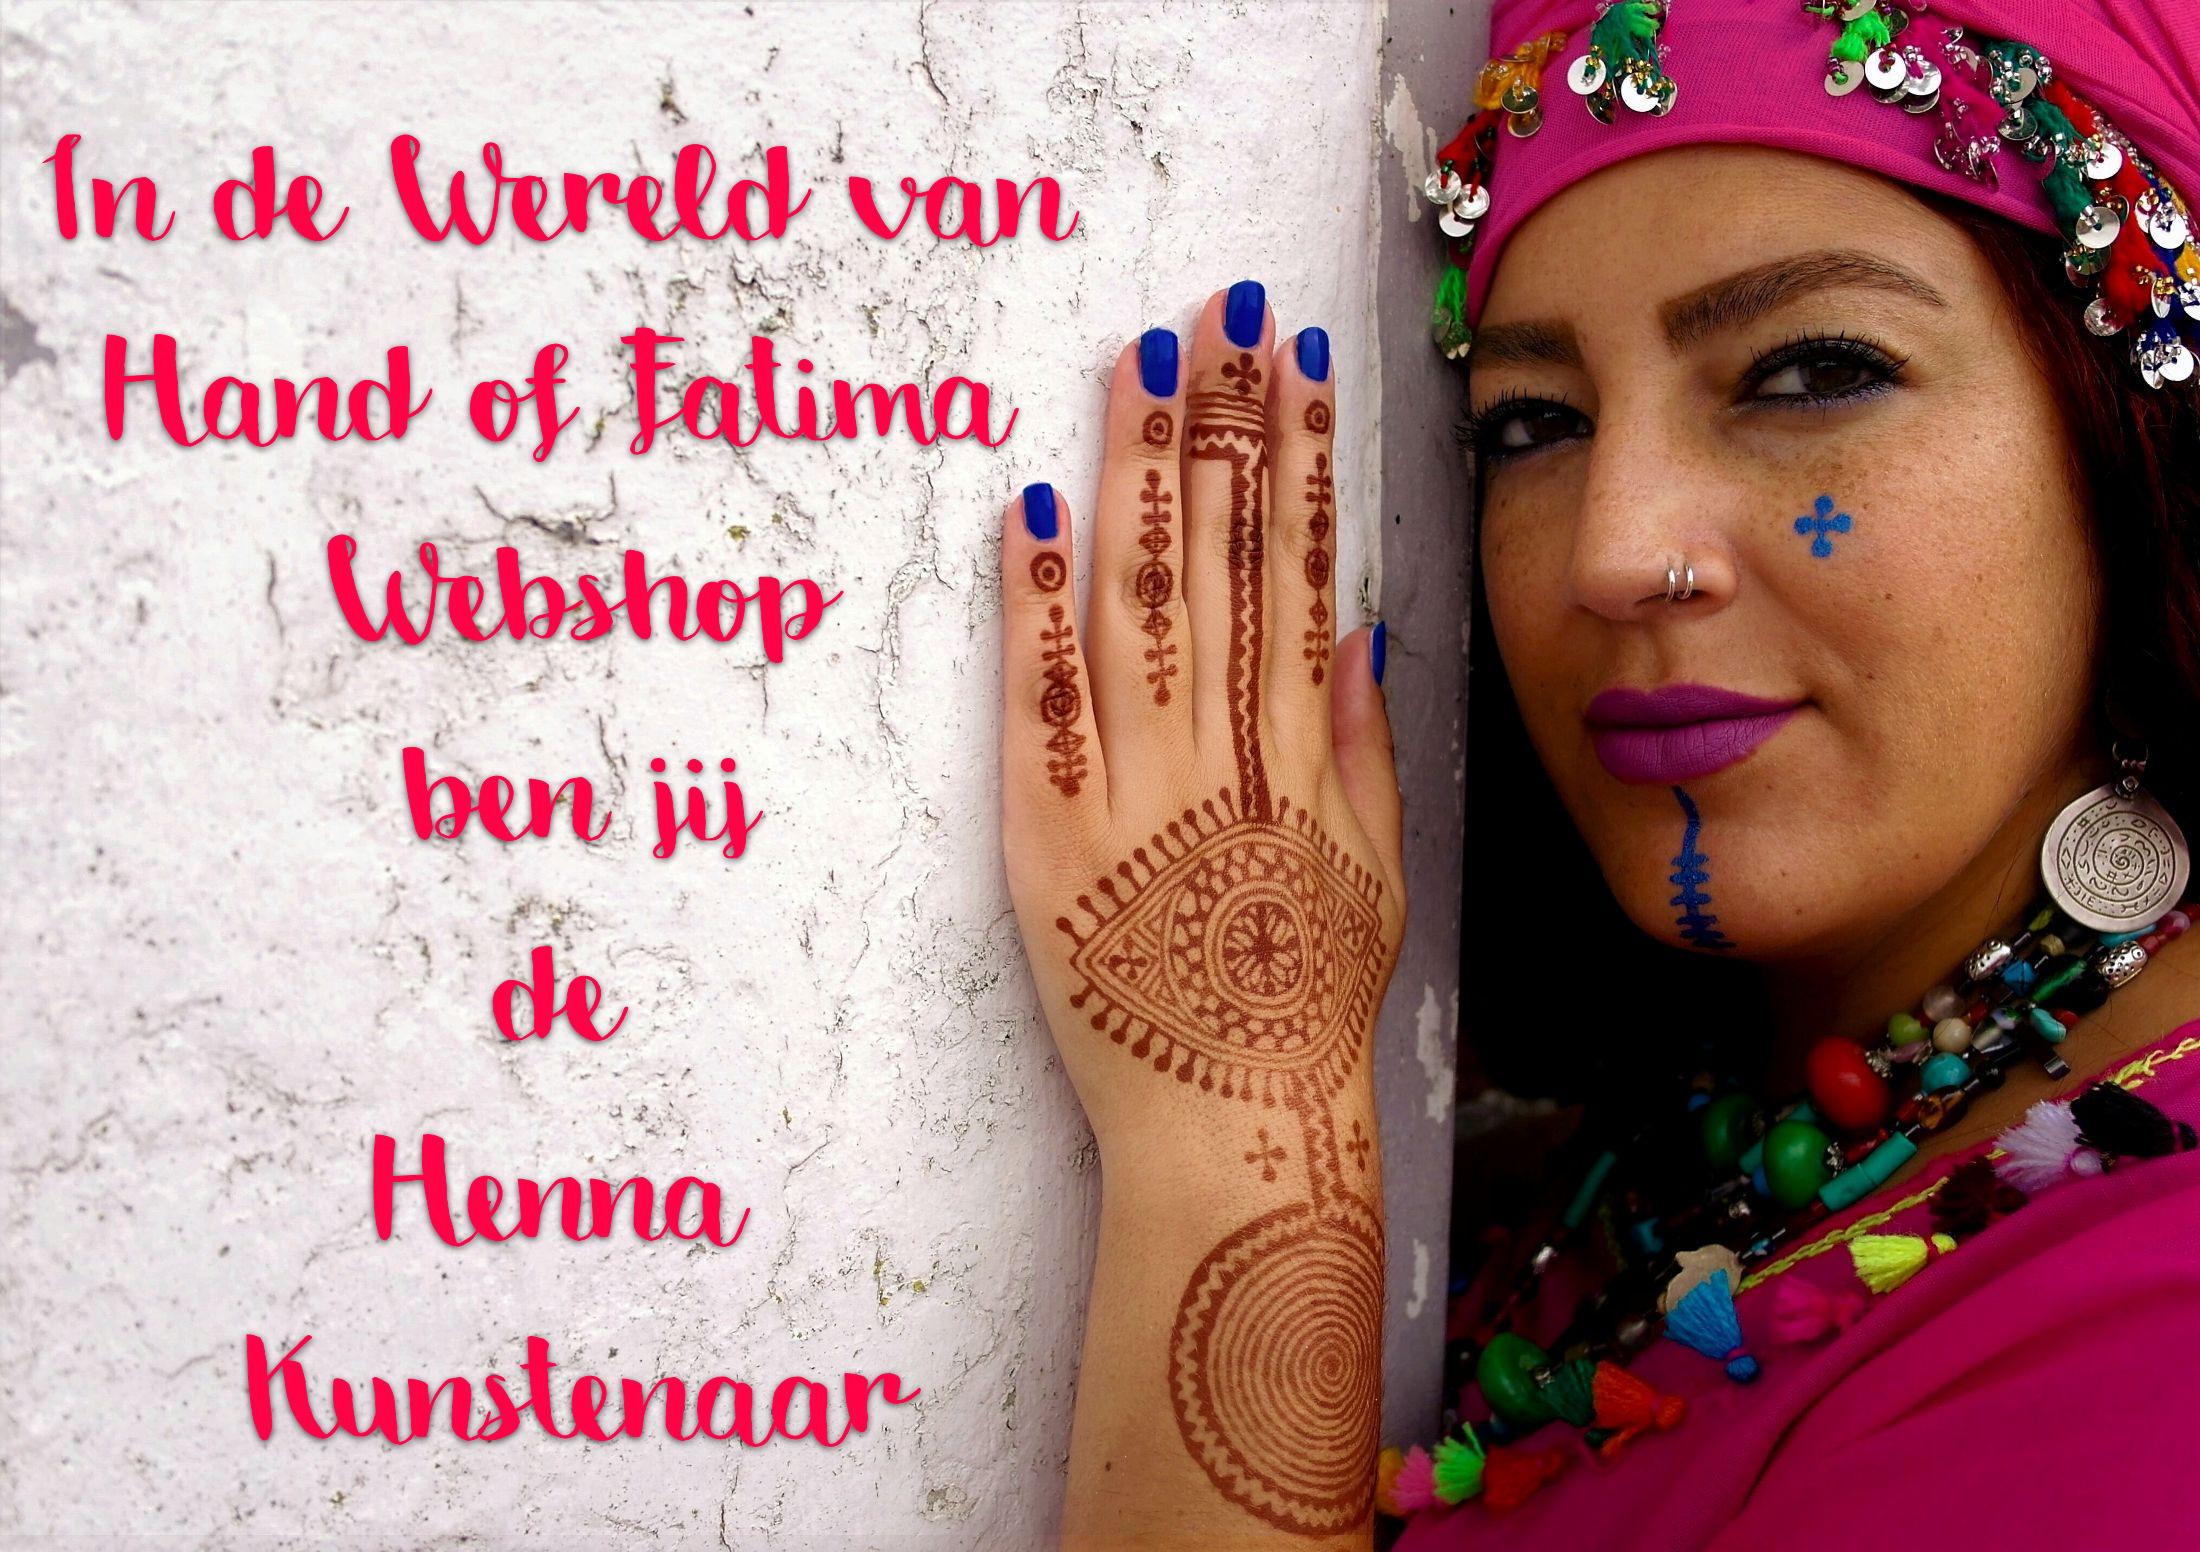 henna hand of fatima webshop welkom slideshow1